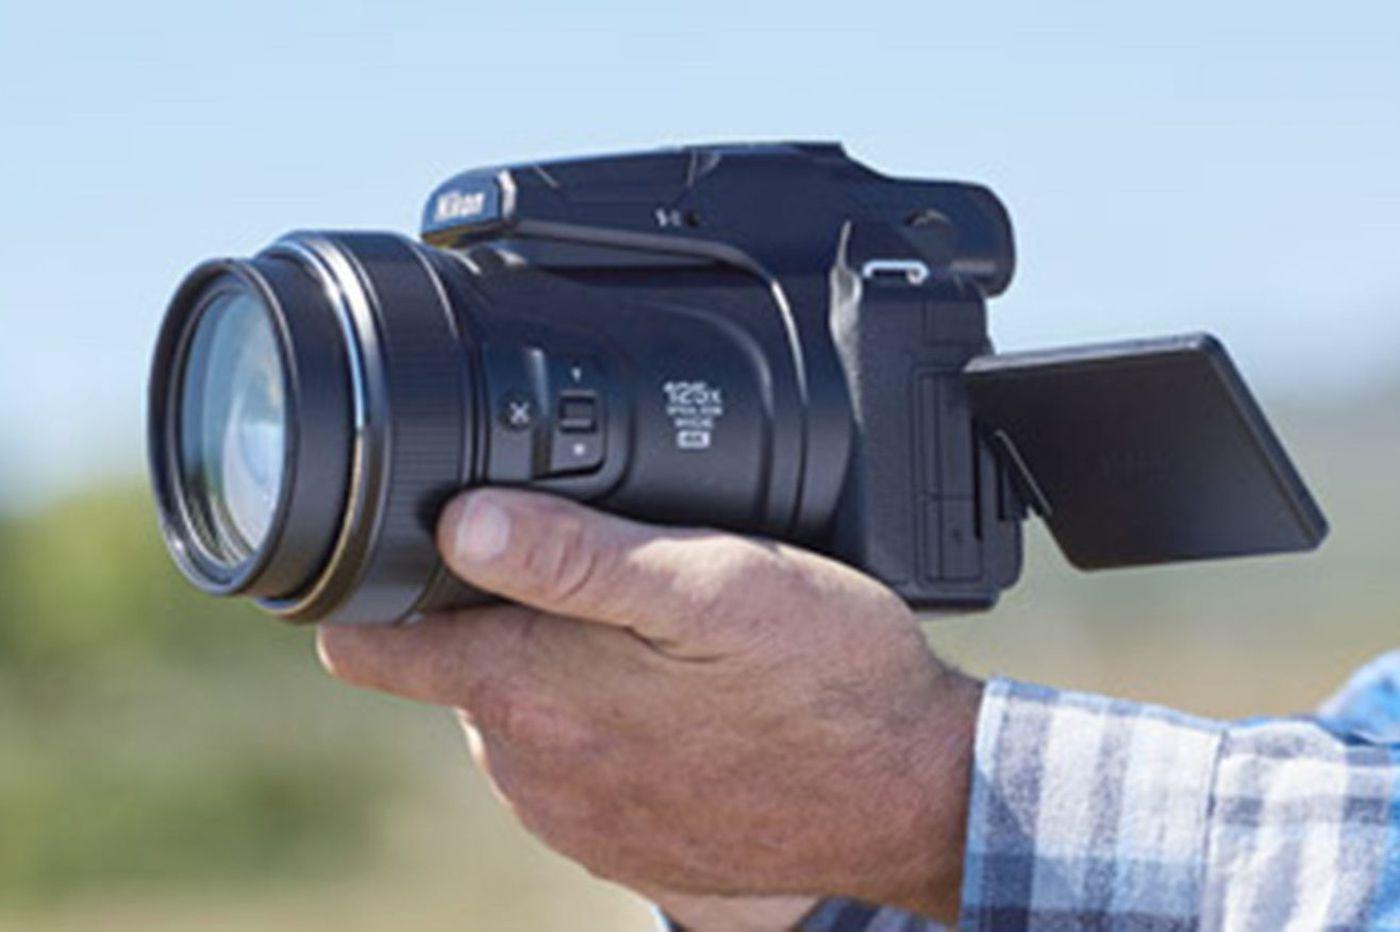 Nikon Coolpix P1000: Can a zoom lens be too big?